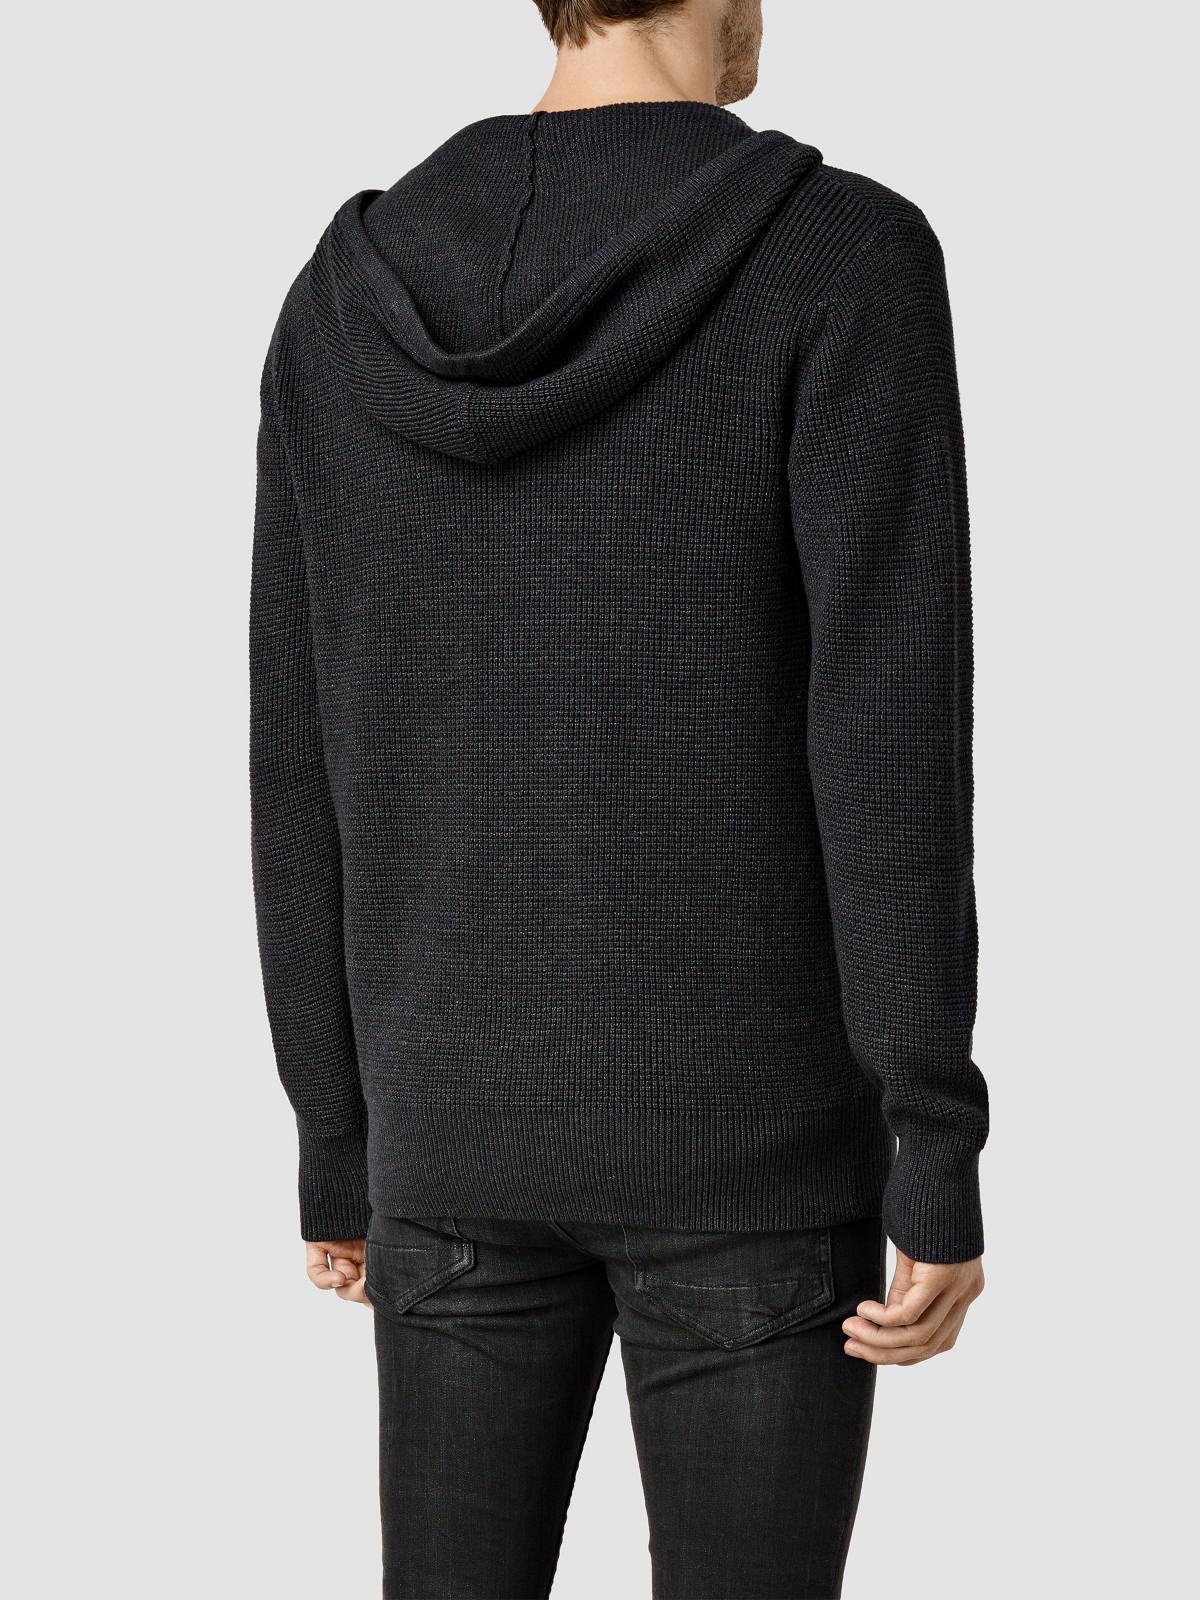 AllSaints Cotton Trias Hoody in Cinder (Black) for Men